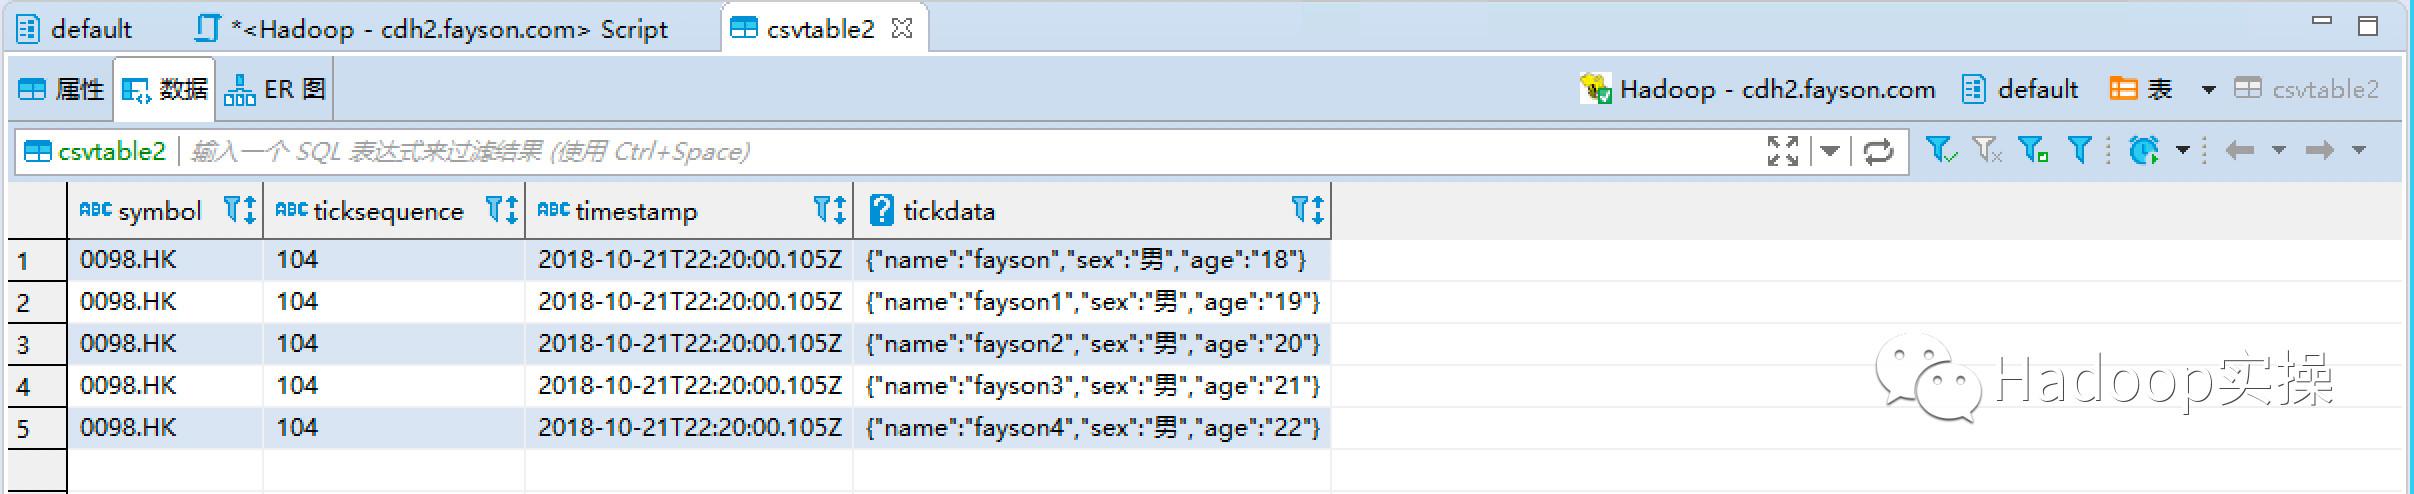 0467-Hadoop客户端工具之Dbeaver安装及使用- Hadoop_SC的博客